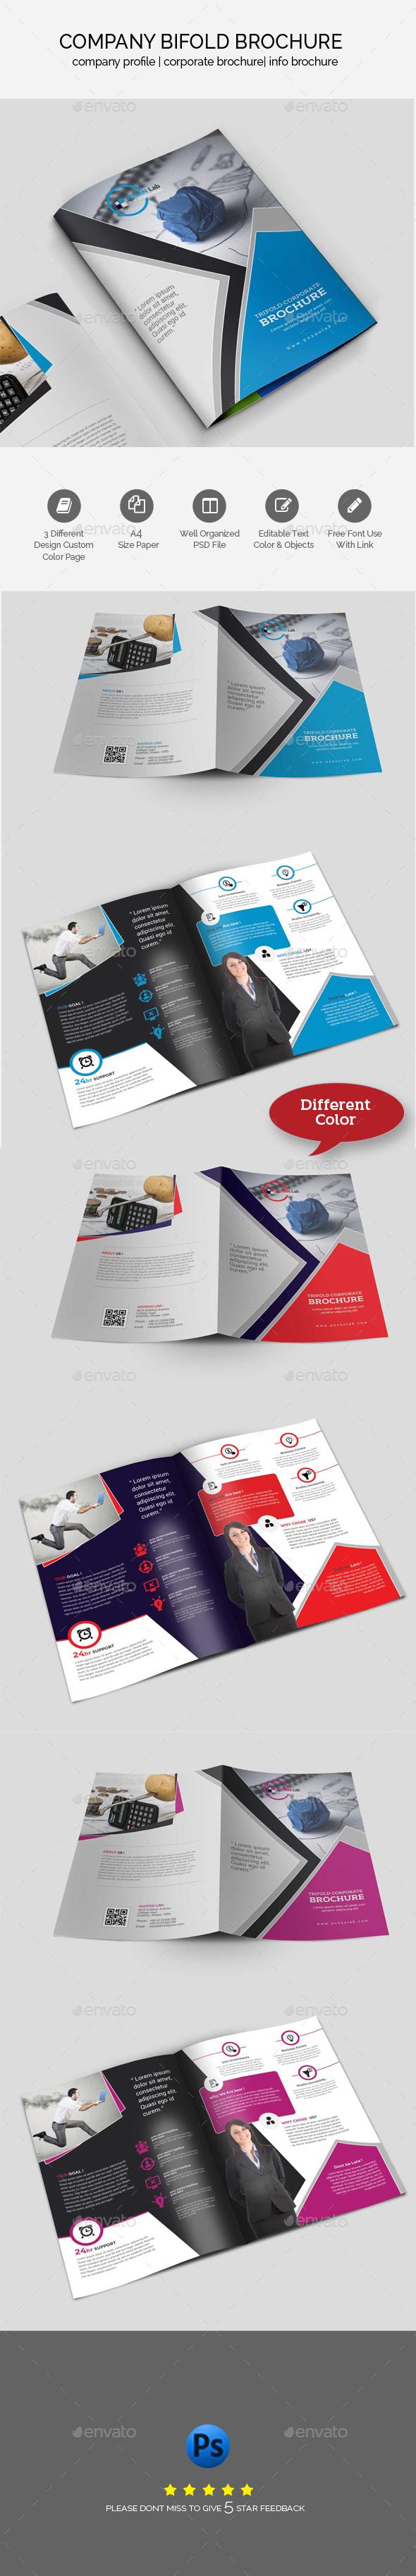 Bifold Brochure Template - Brochures Print Templates